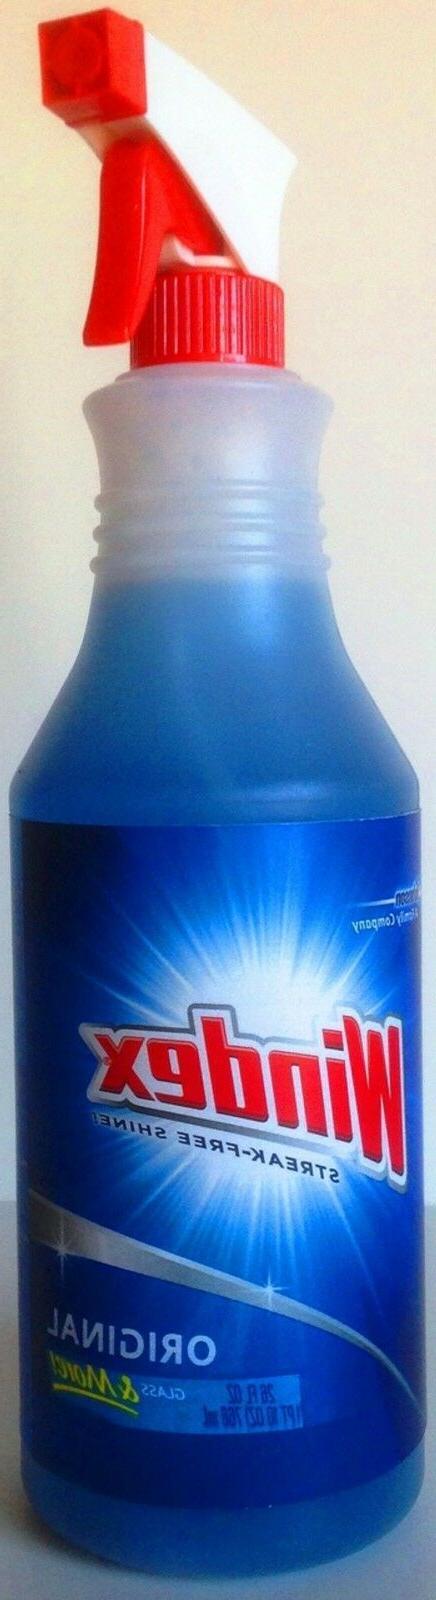 Windex Diversion Bottle Disguised Storage Fake Stash